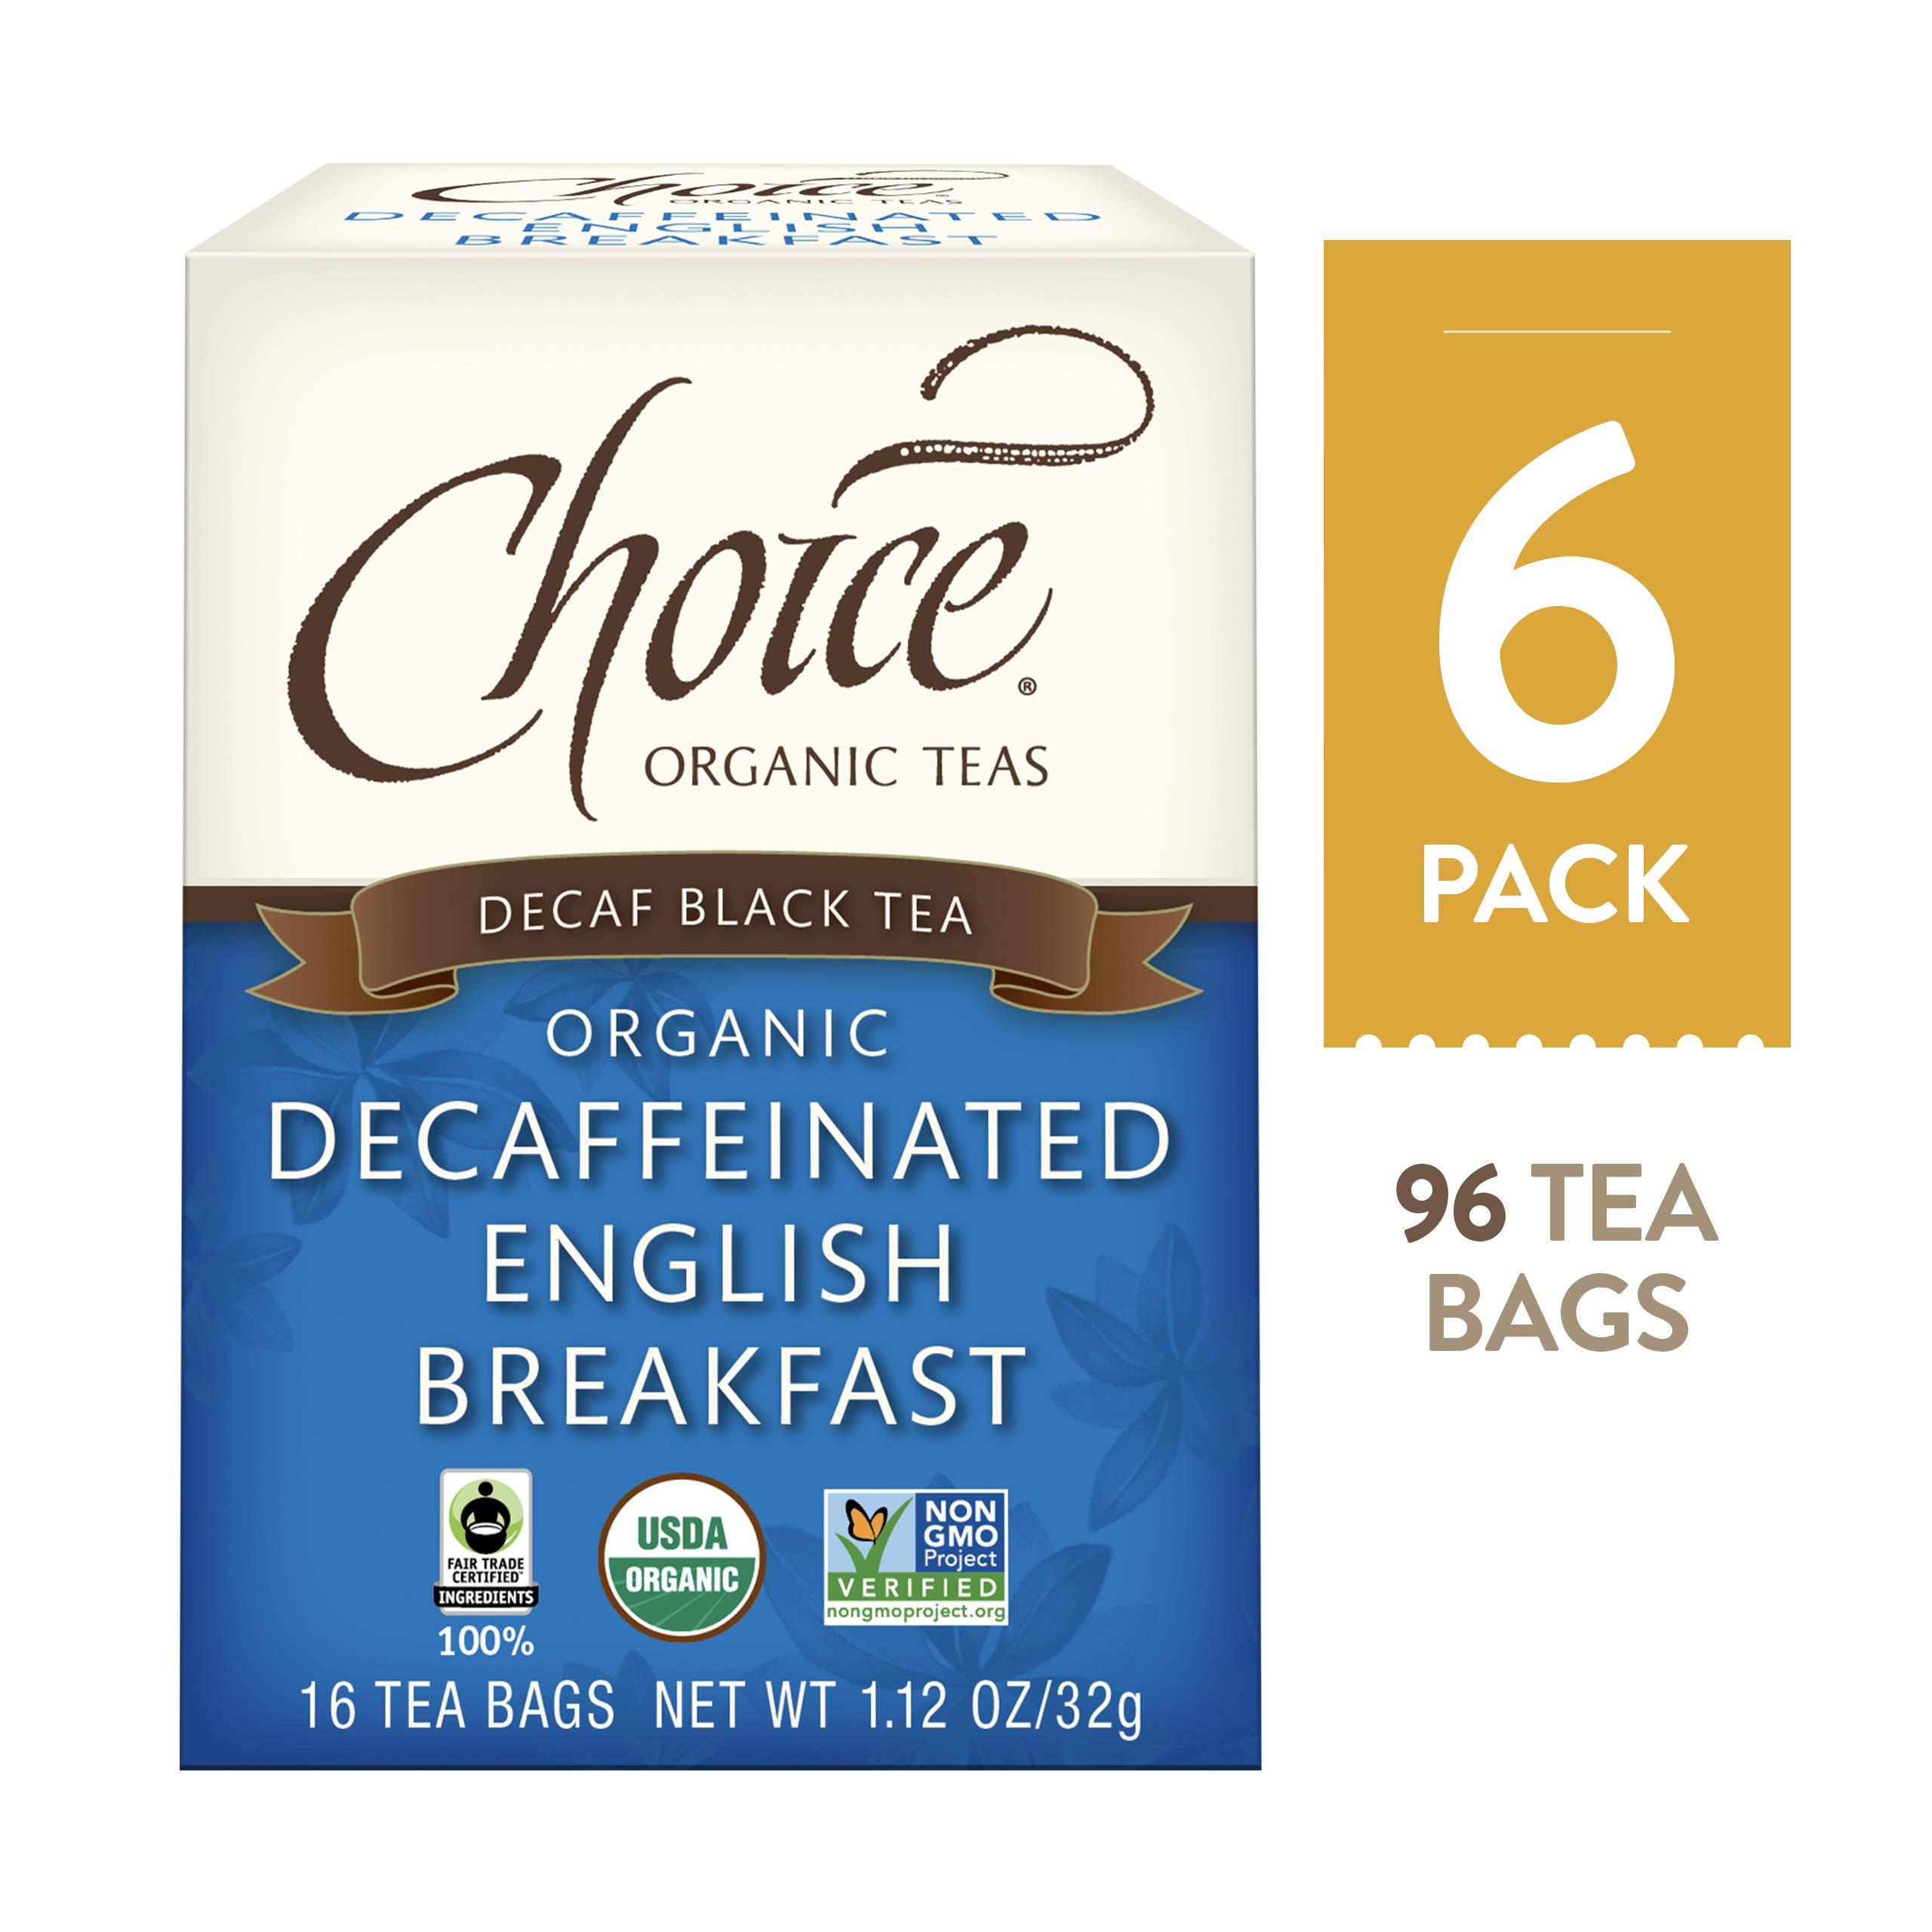 Choice Organic Teas Black Tea, Decaffeinated English Breakfast, 16 Count, Pack of 6 by Choice Organic